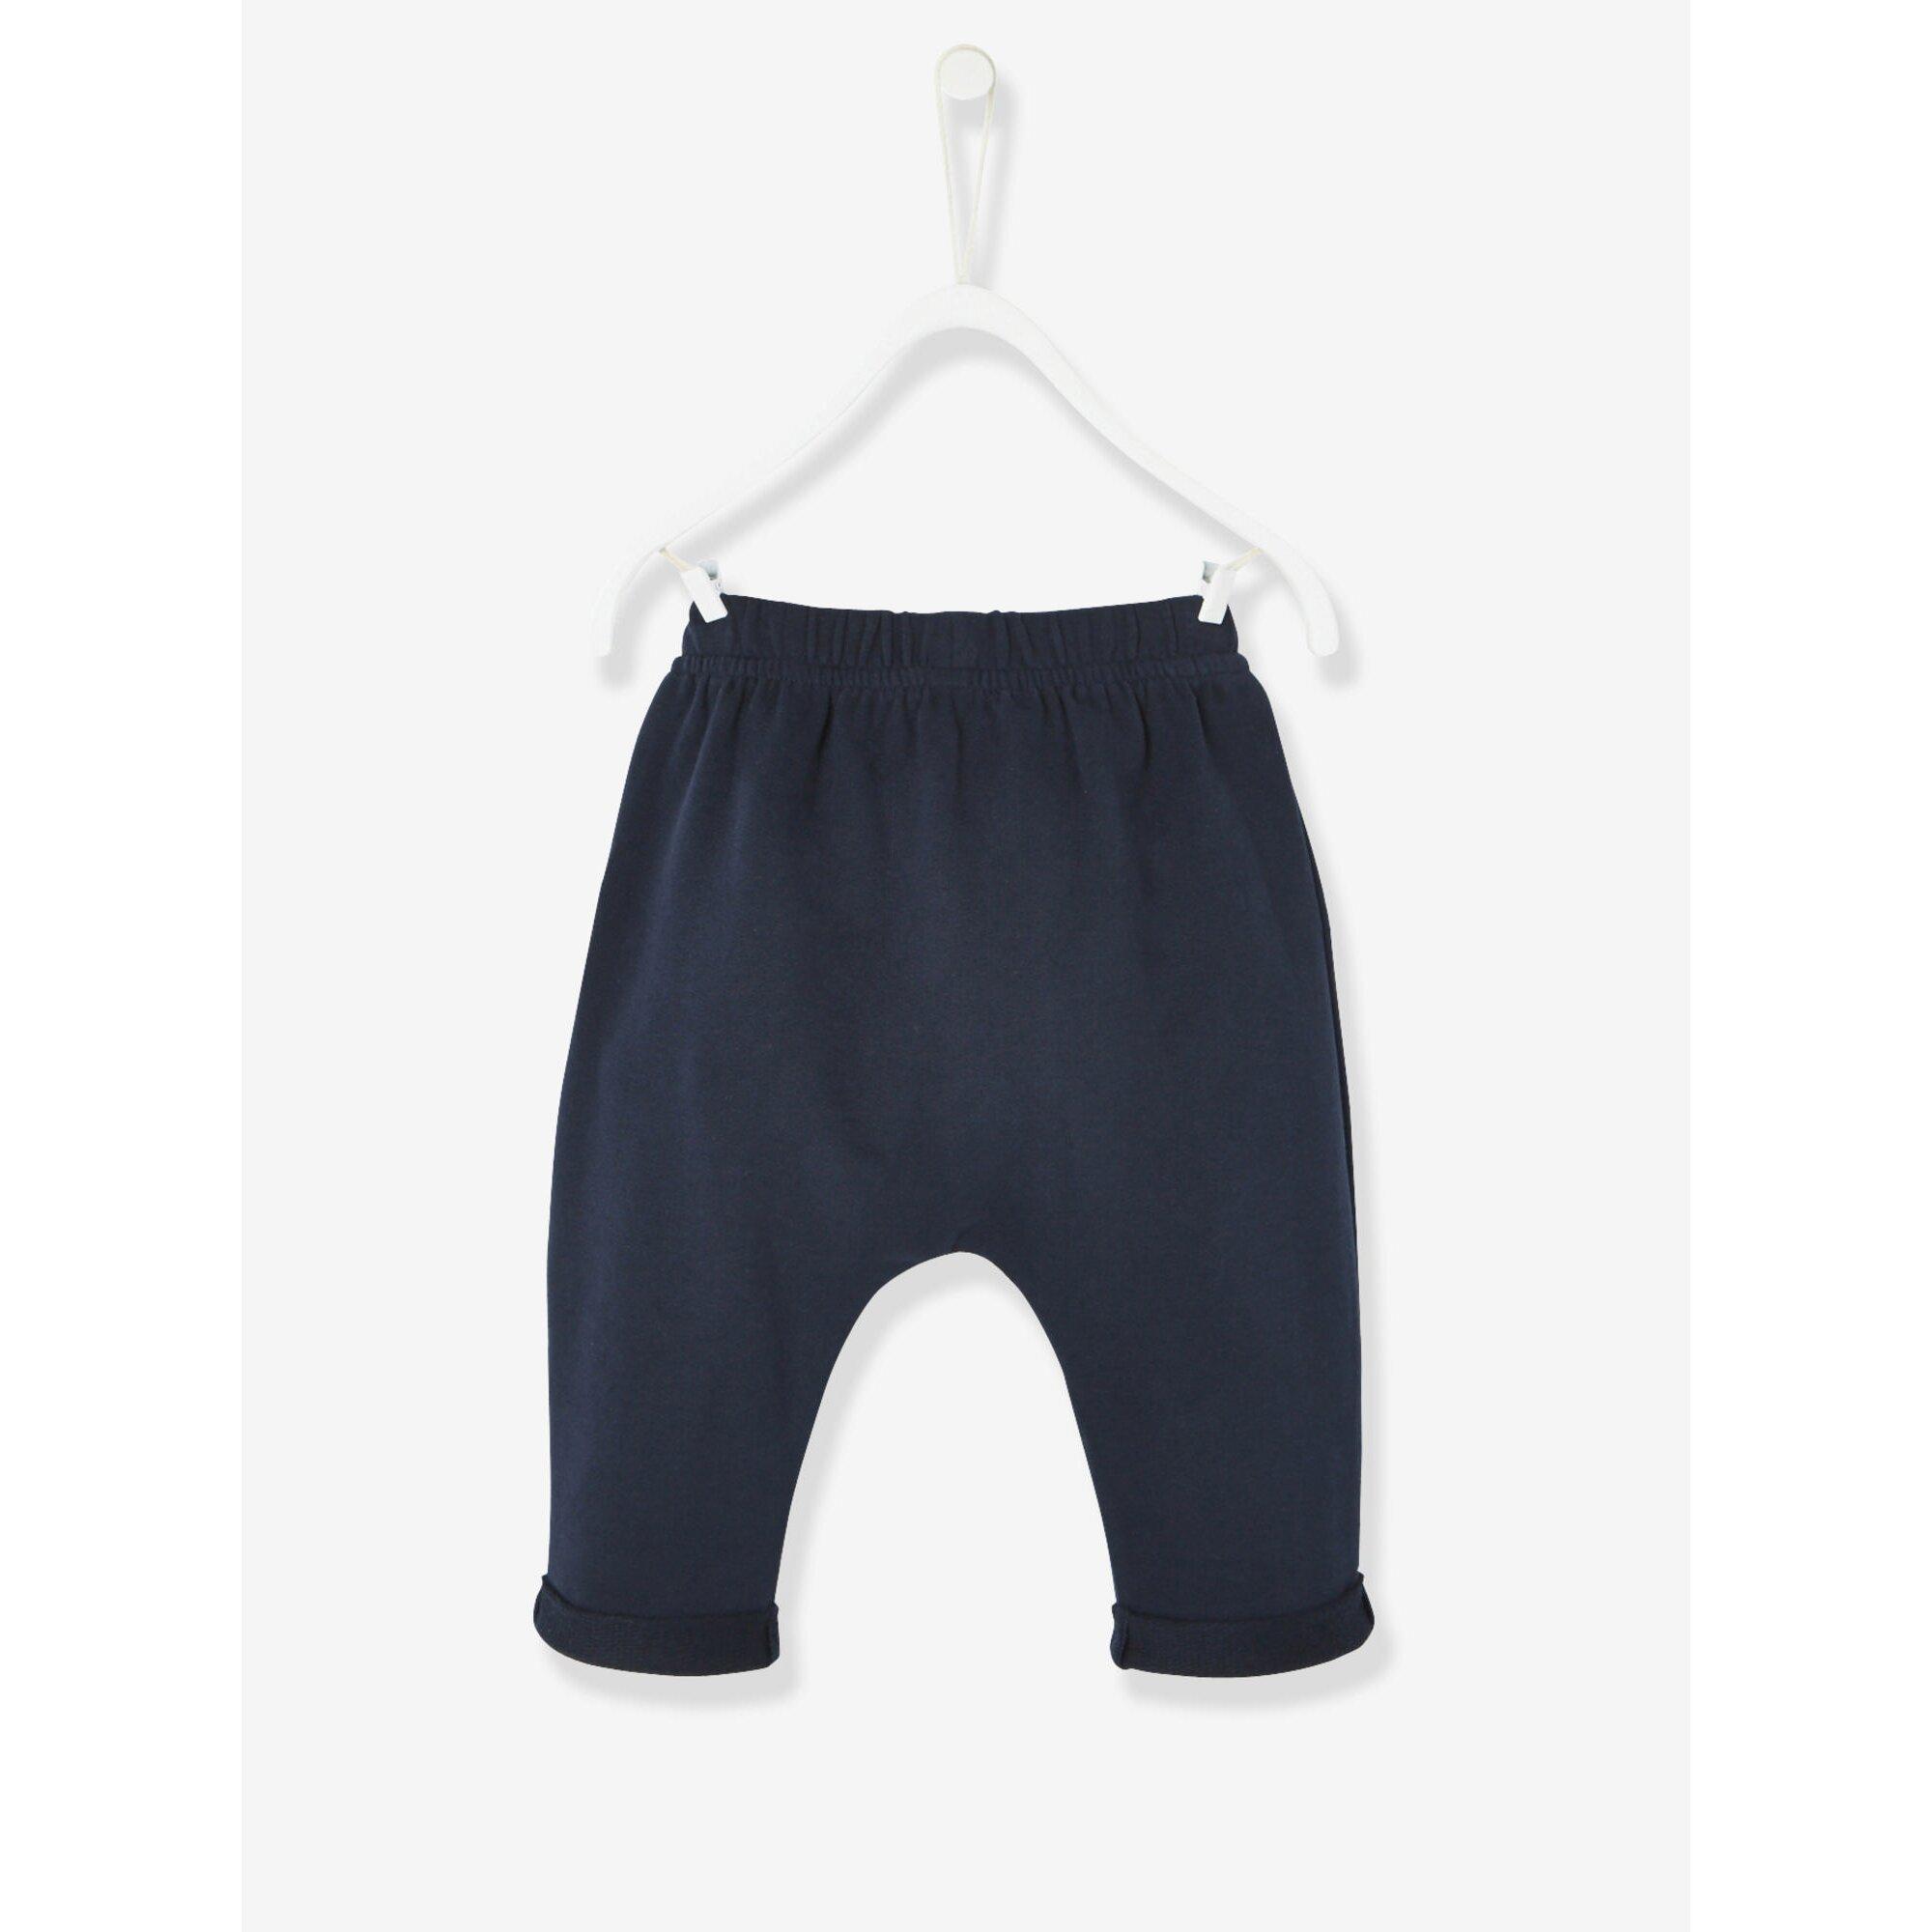 vertbaudet-haremshose-aus-sweatware-fur-babys